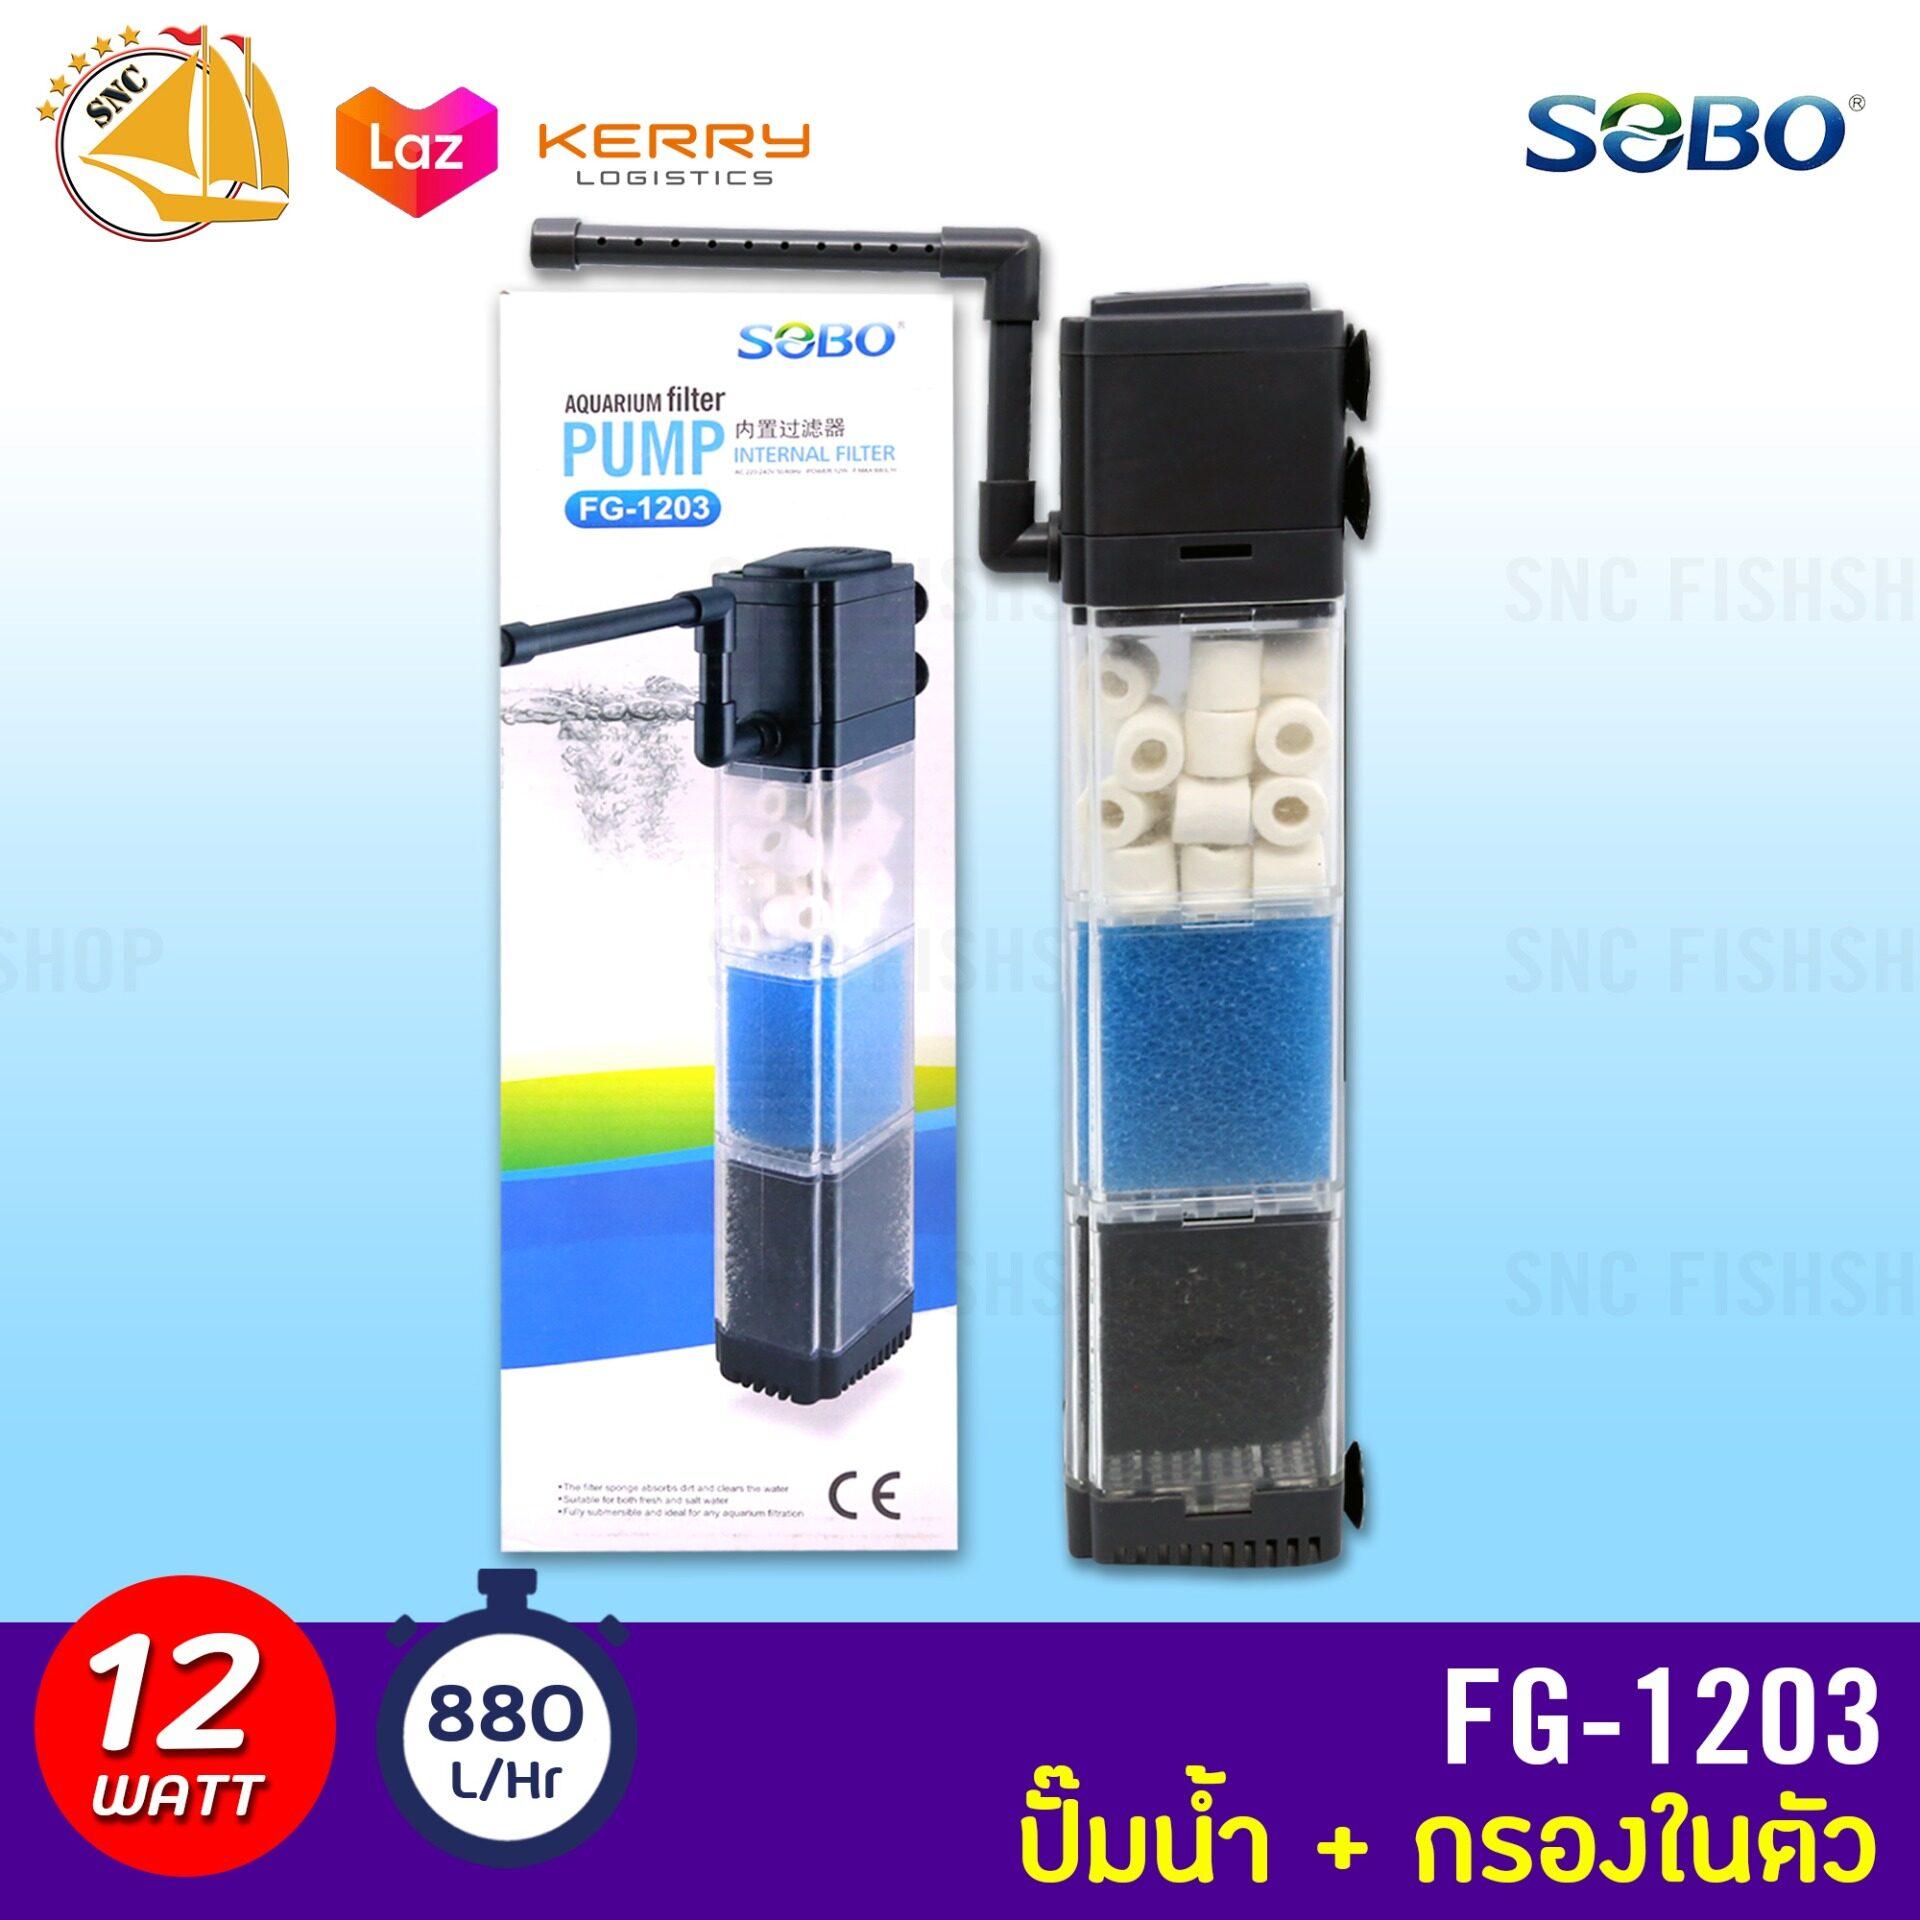 SOBO FG-1203 ปั๊มน้ำพร้อมกรอง กรองพร้อมปั๊มน้ำสำหรับตู้ปลาขนาด 24-30นิ้ว